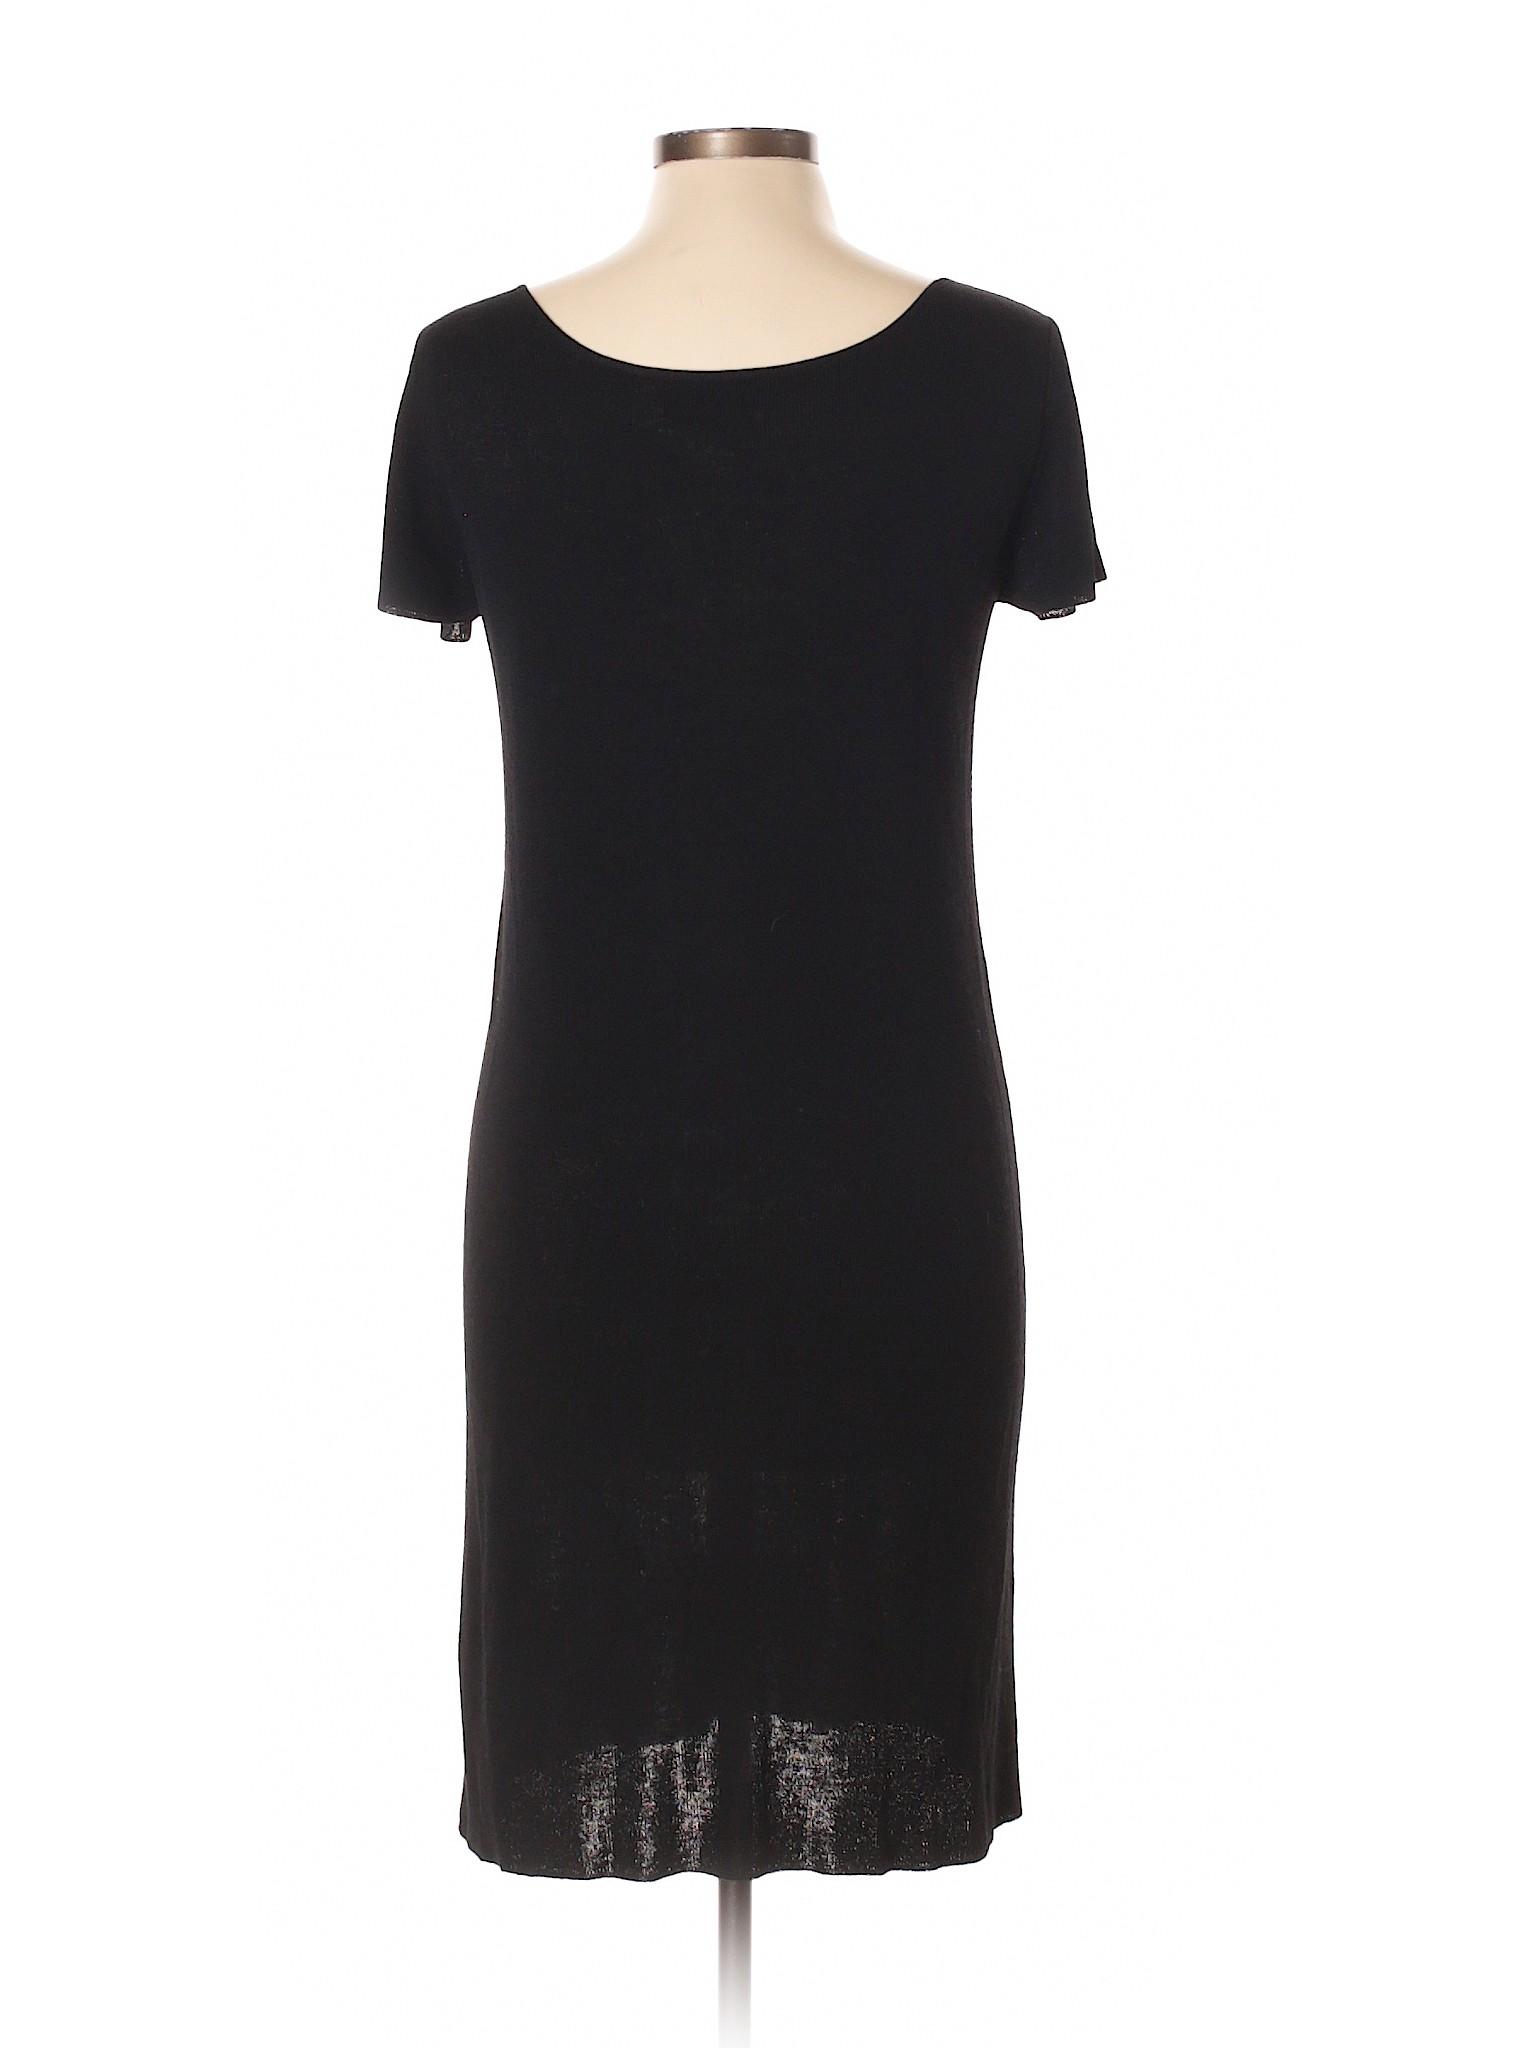 DKNY Casual Selling Dress Casual Selling DKNY Dress FXqFRZ5